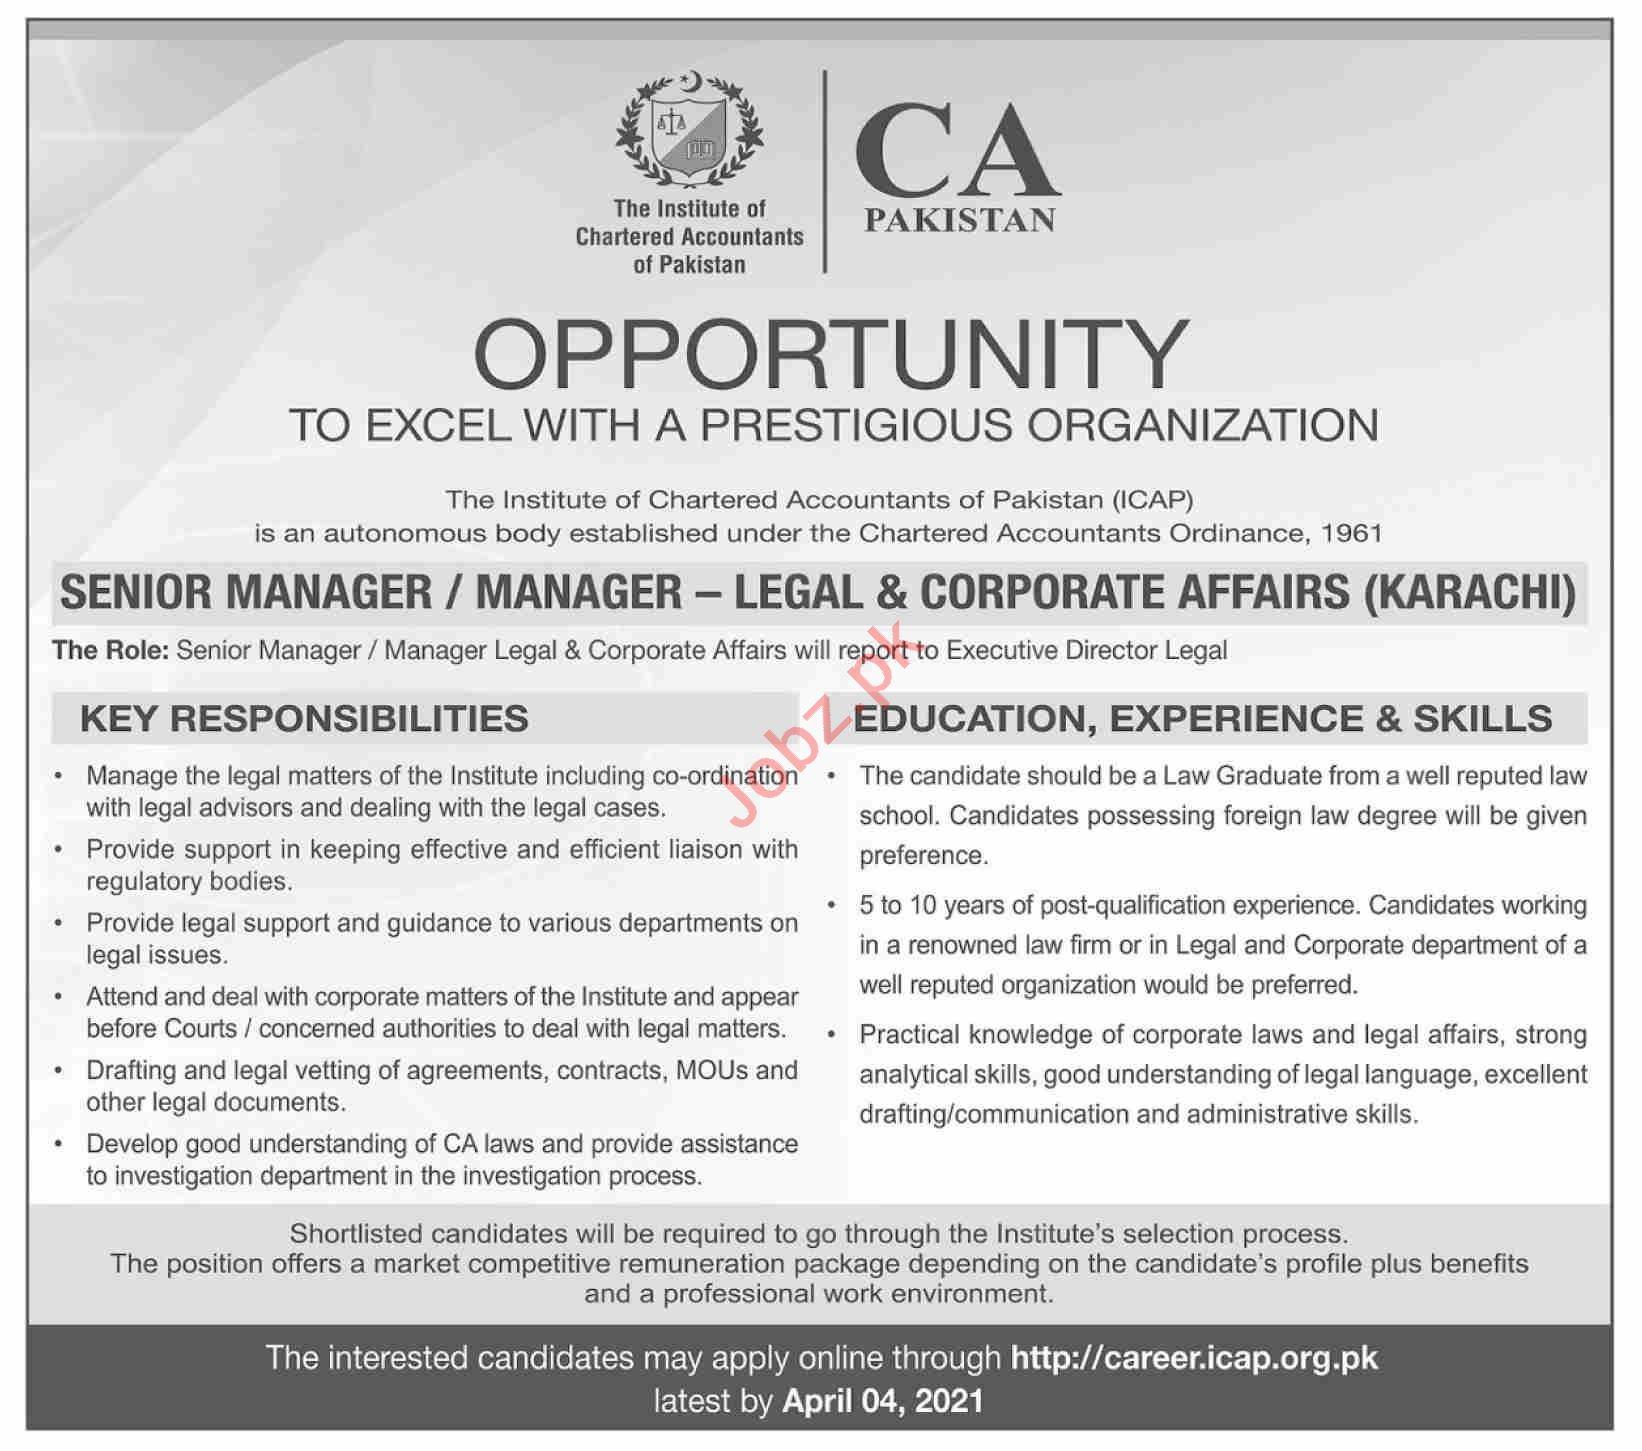 CA Pakistan Jobs 2021 for Senior Manager Legal Affairs